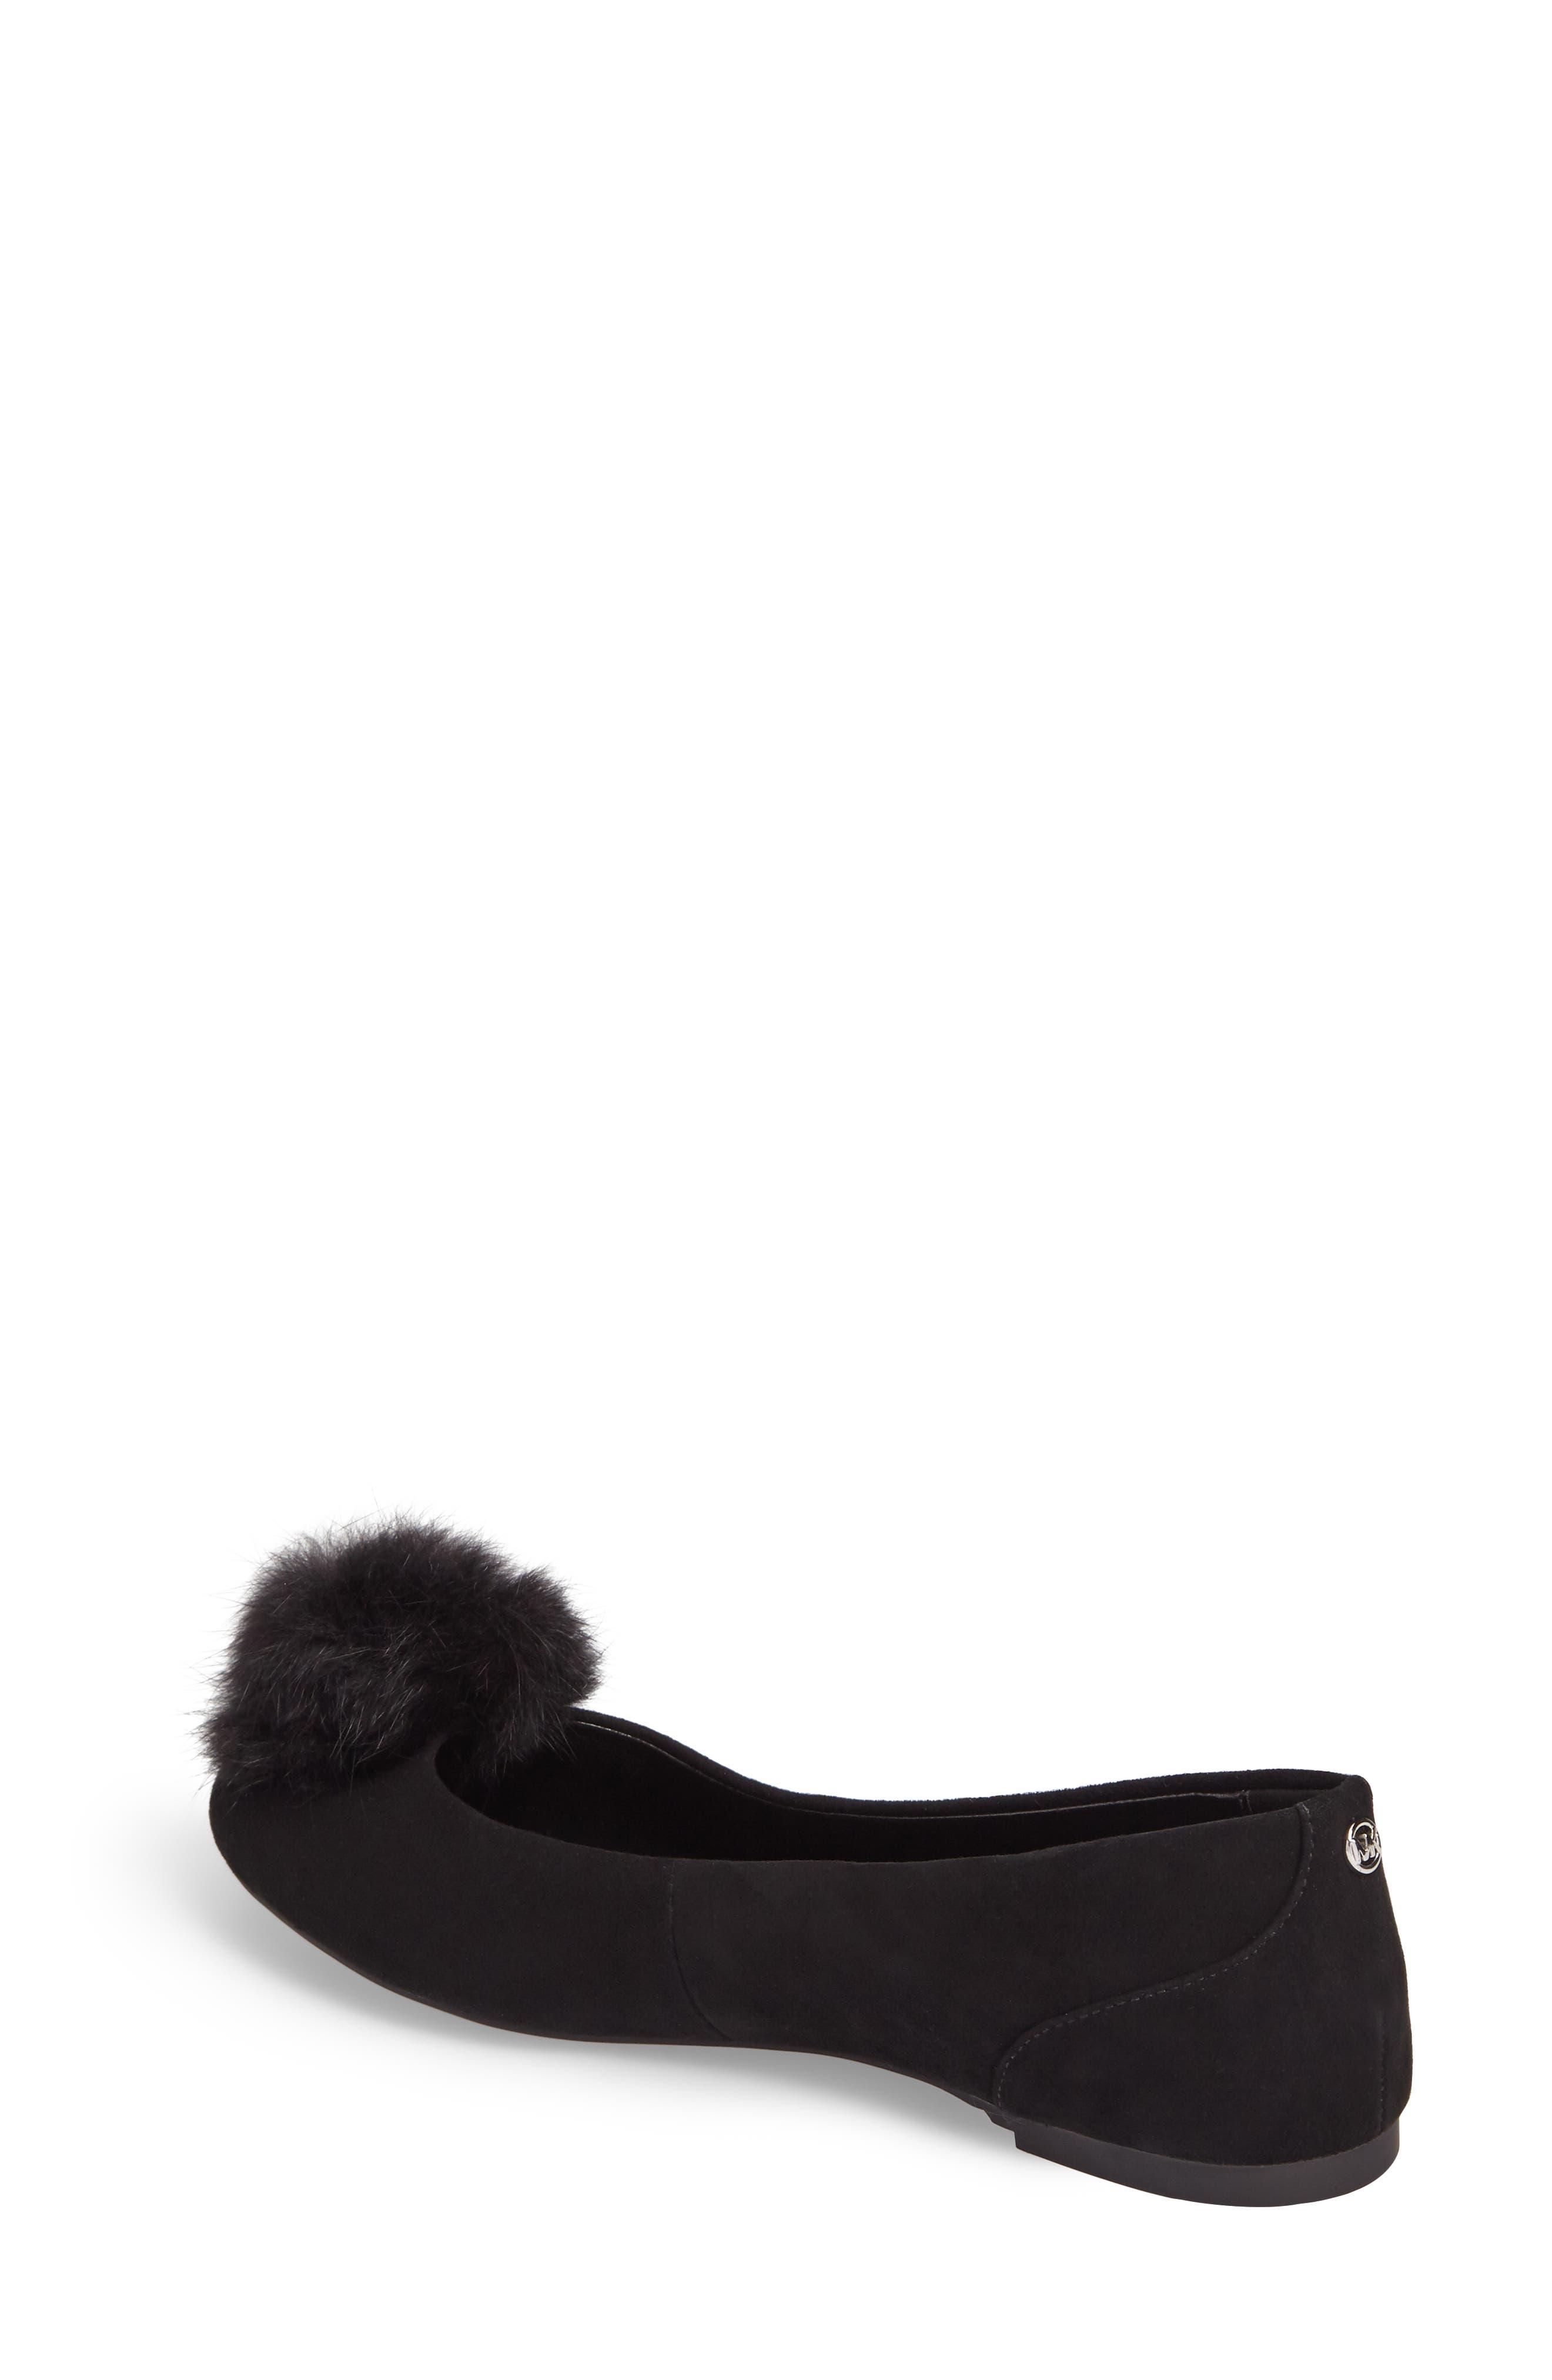 Remi Ballet Flat with Genuine Rabbit Fur Pom,                             Alternate thumbnail 2, color,                             001